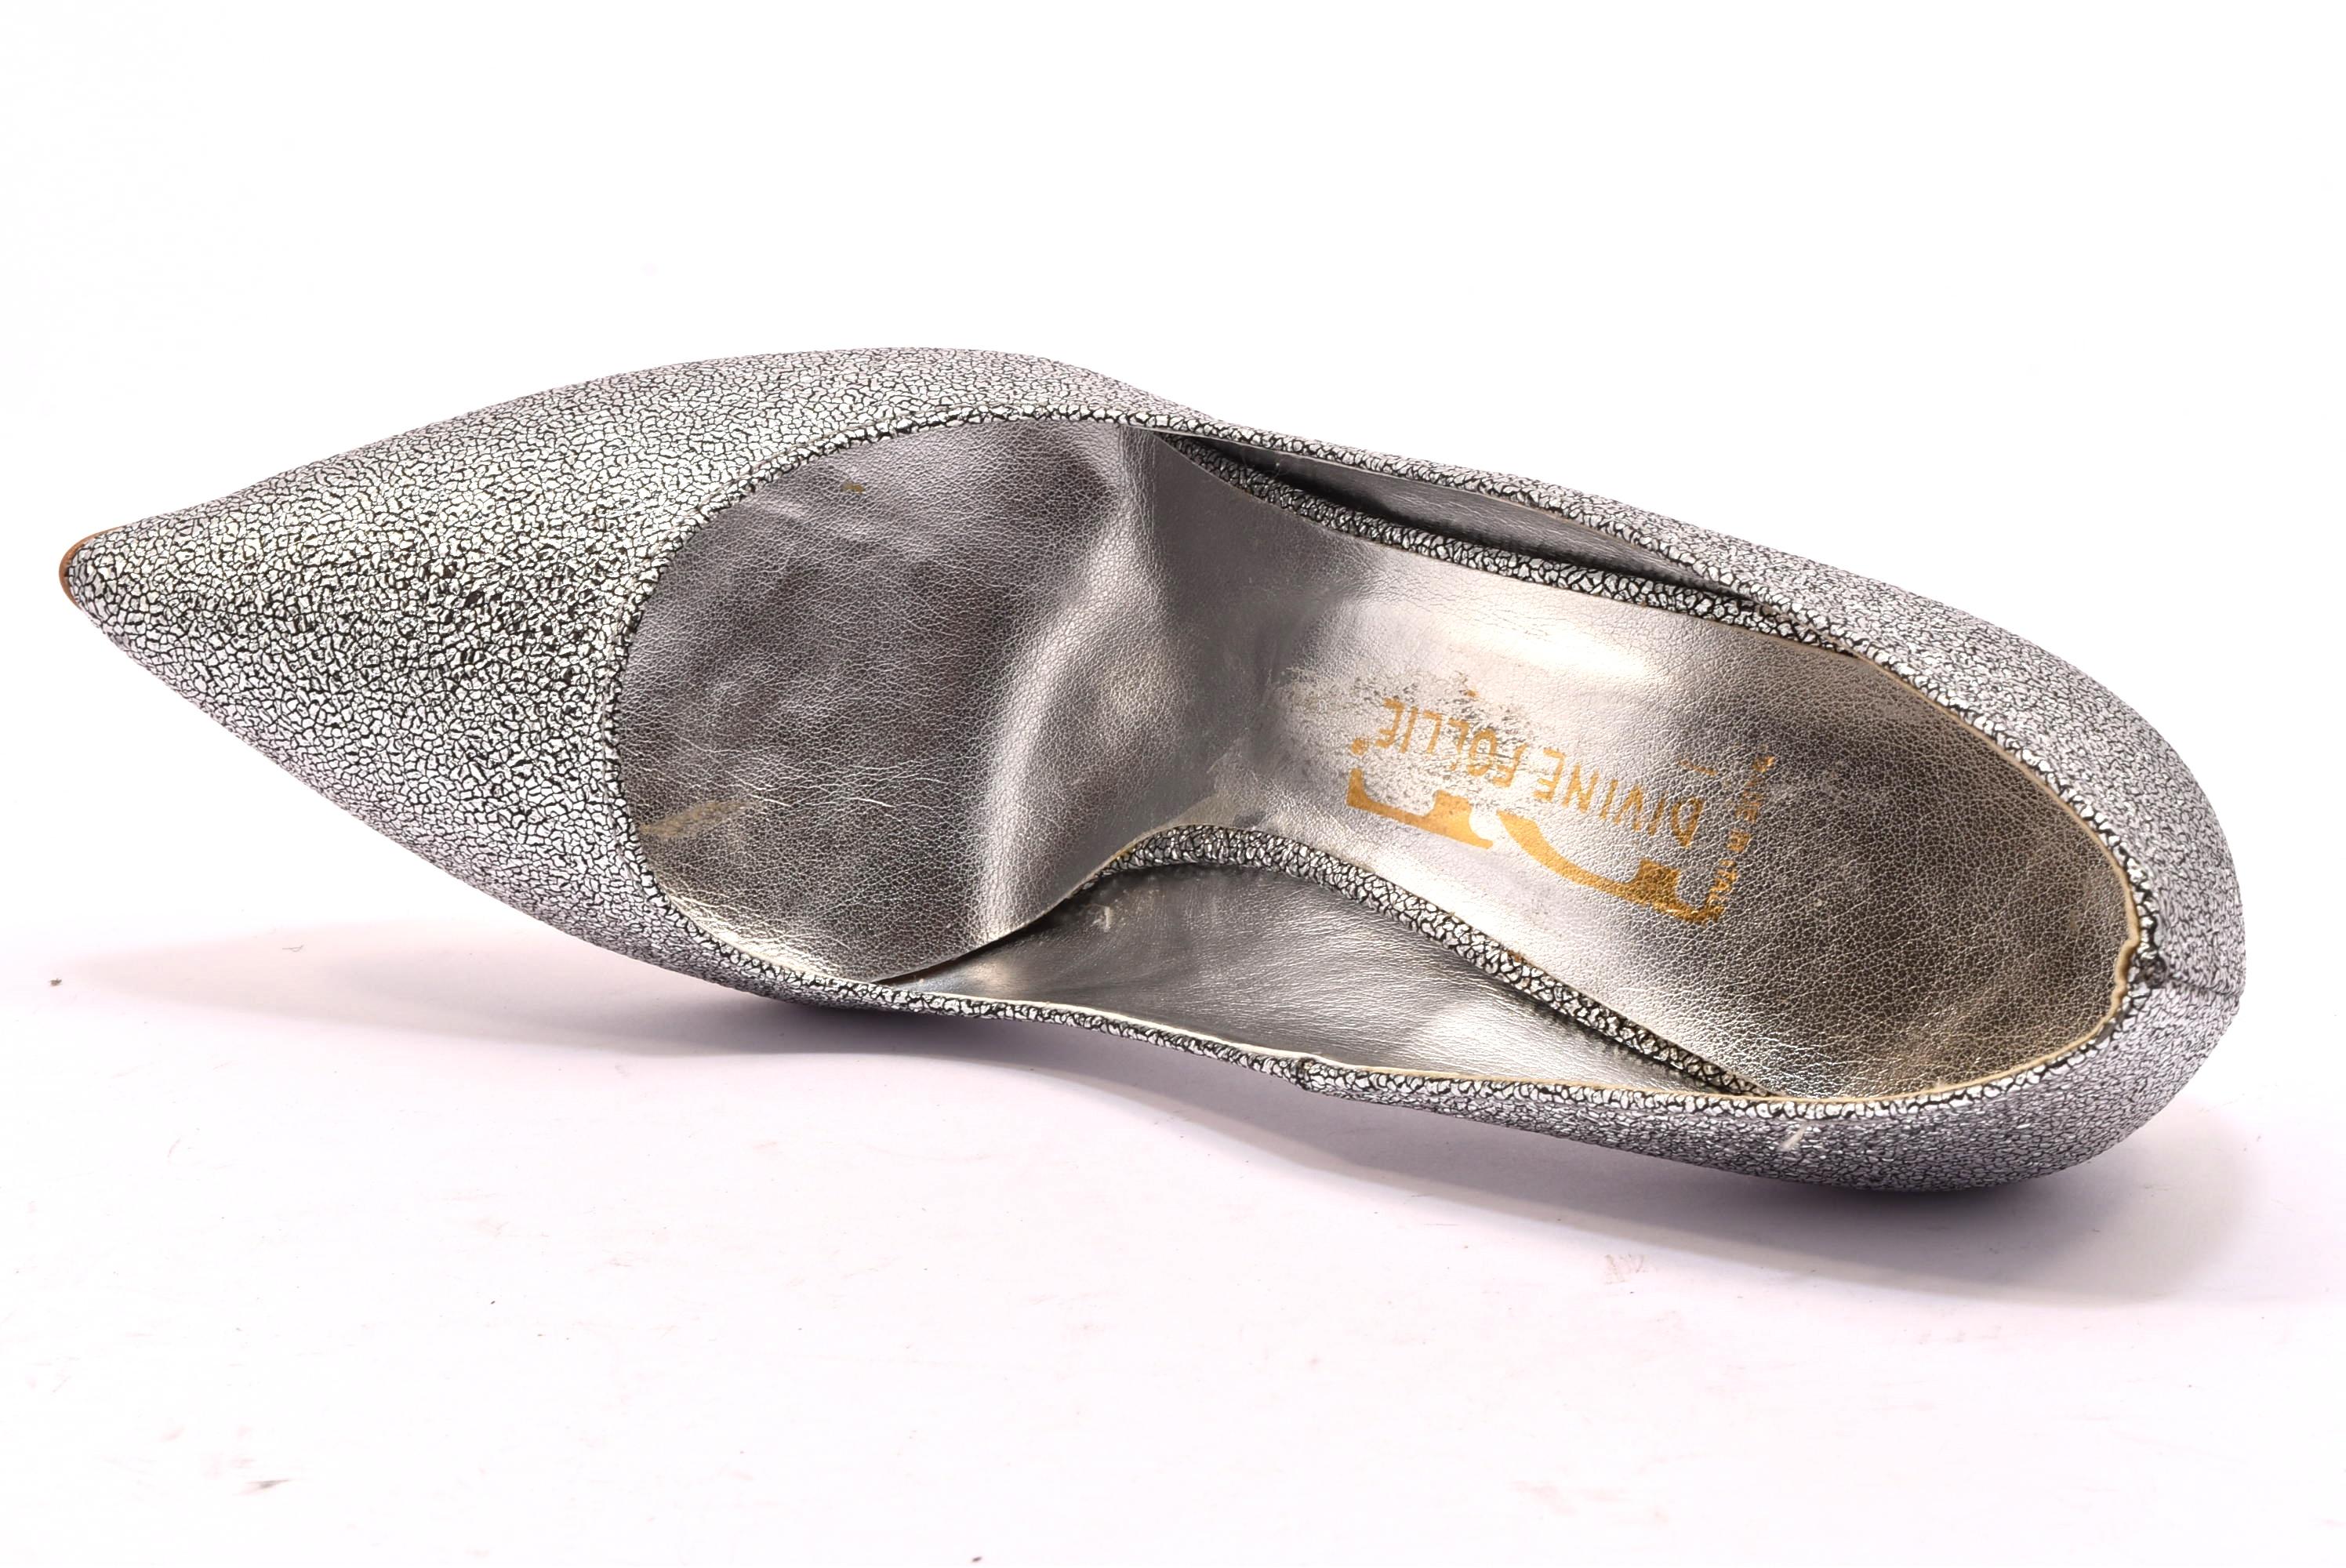 ... DIVINE FOLLIE 270 ARGENTO scarpe tacchi punta sfilata décolleté donna  glitter estiva ... 0da15fc1359